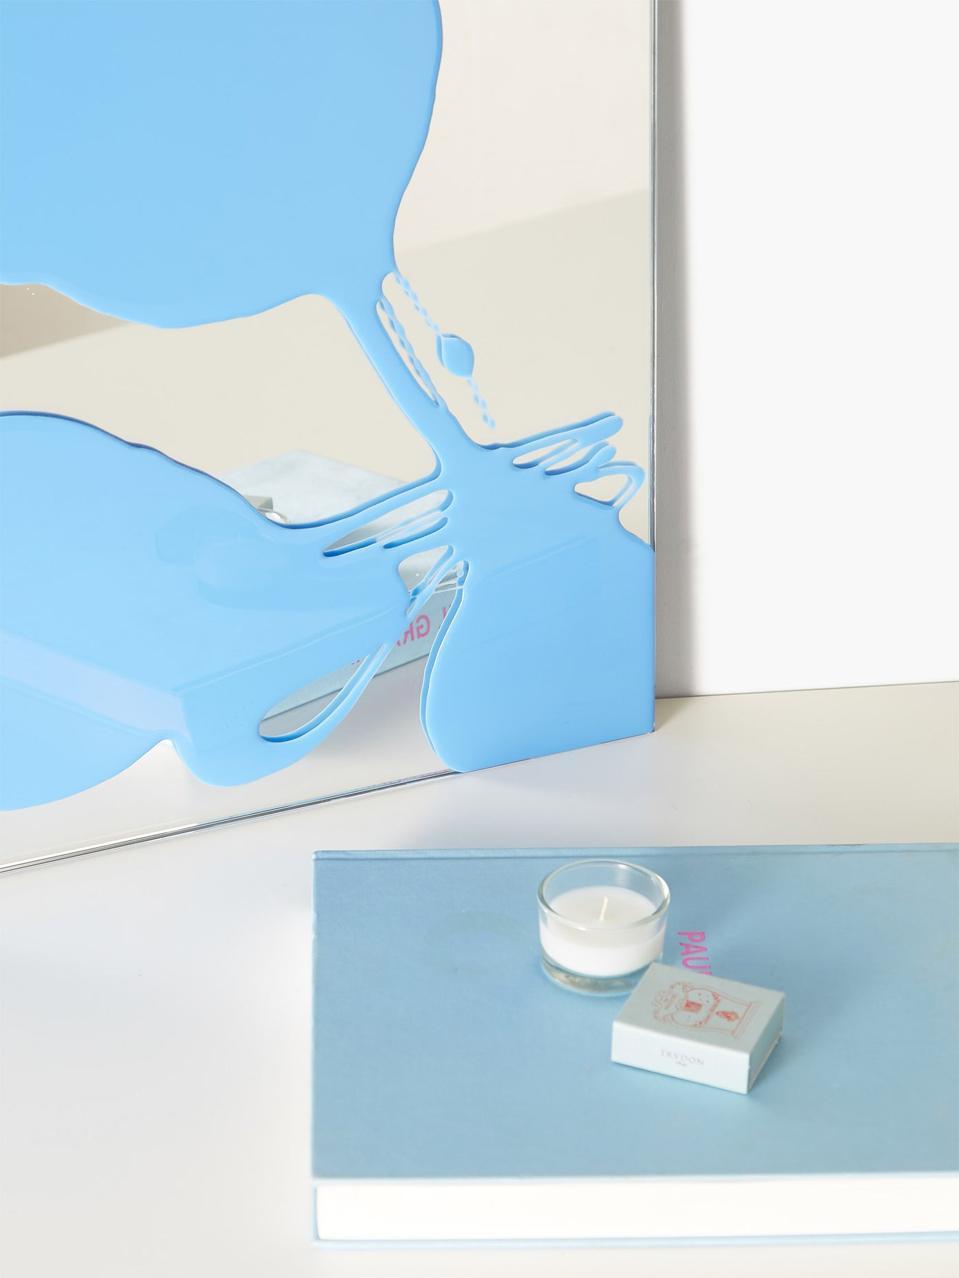 Glaze Splash Mirror by Sabine Marcelis: